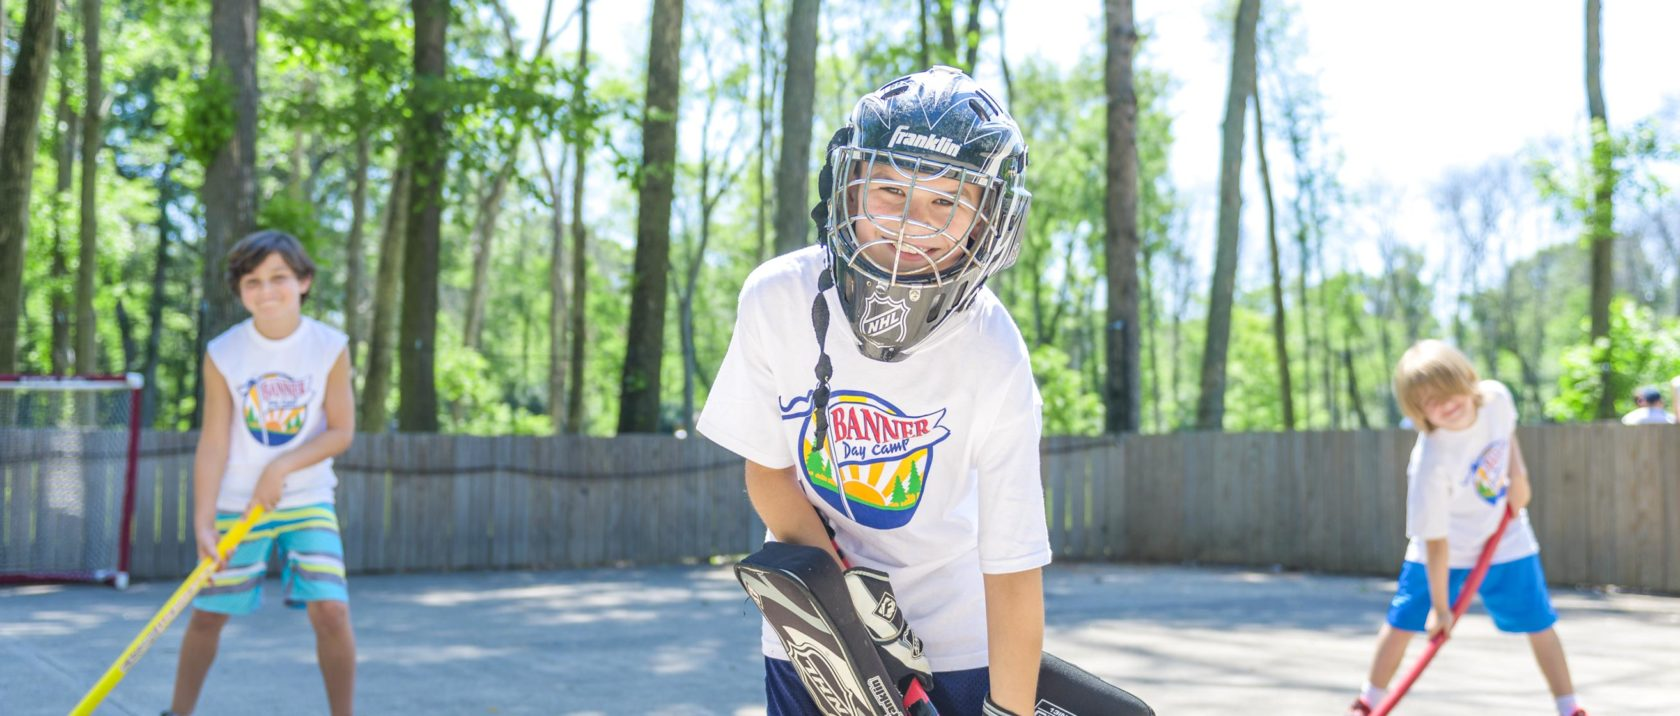 Boy campers playing street hockey